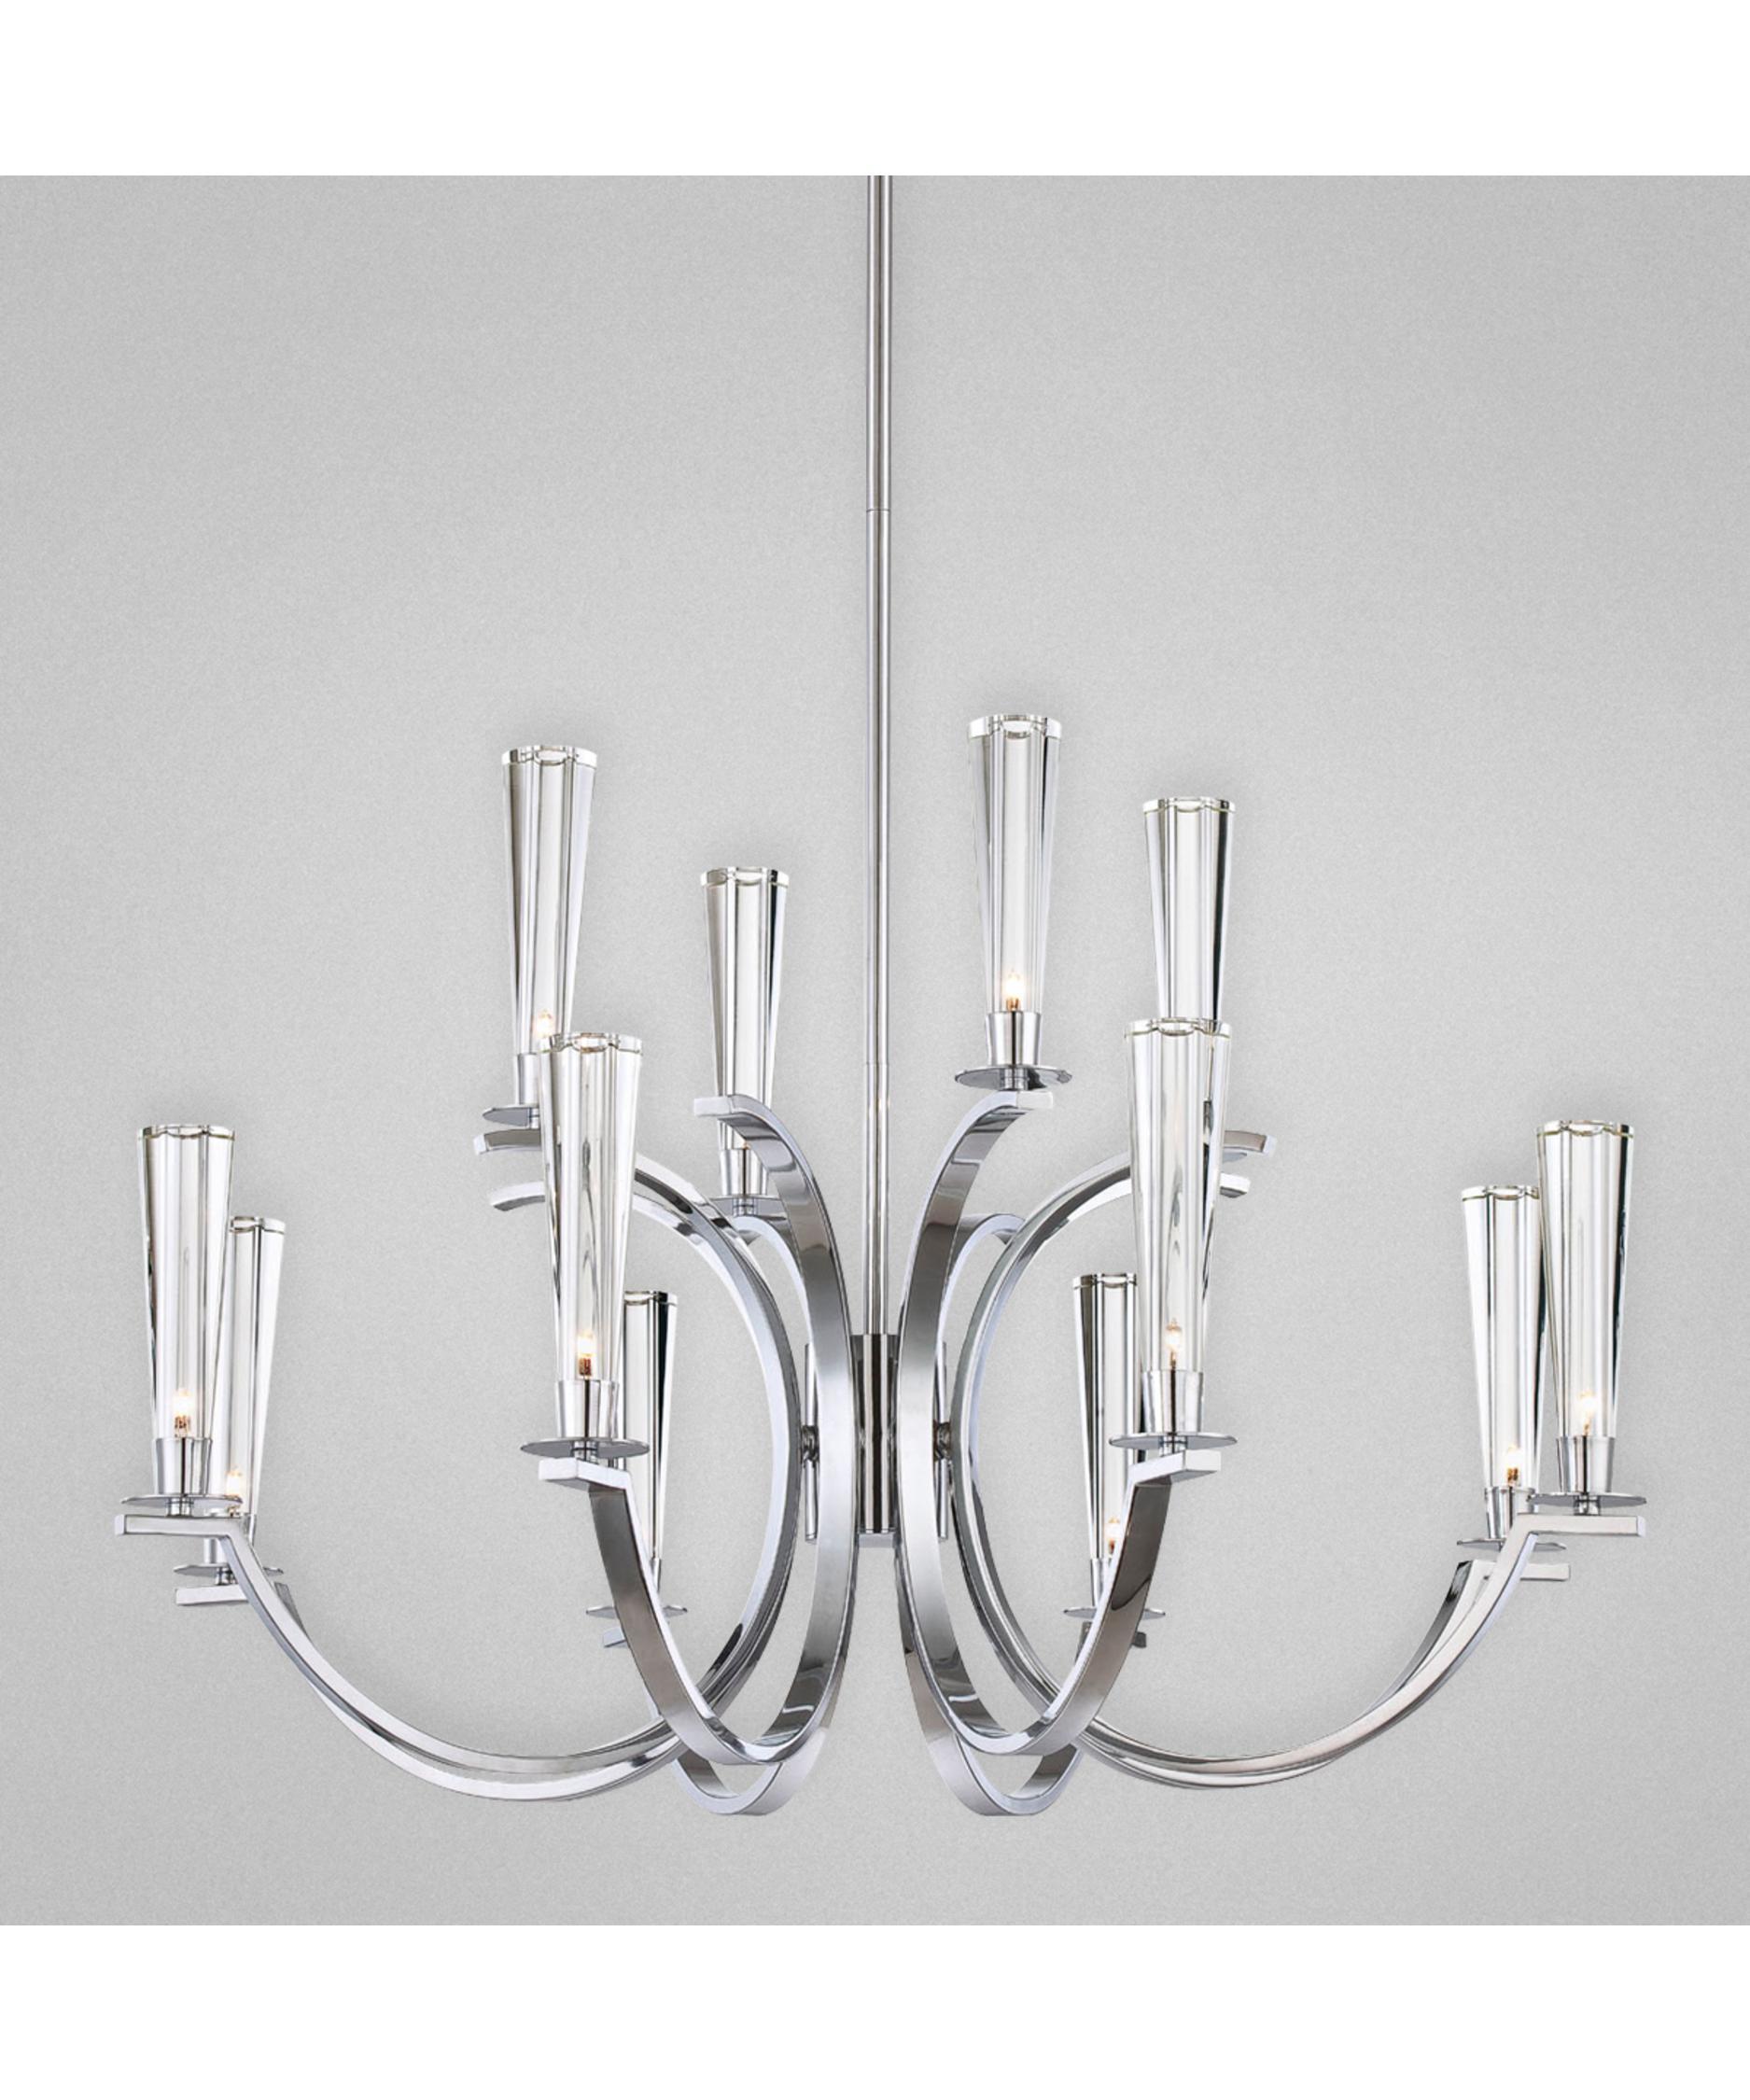 Eurofase Chandelier: Eurofase Lighting Cromo Chandelier | Capitol Lighting 1-800lighting.com,Lighting